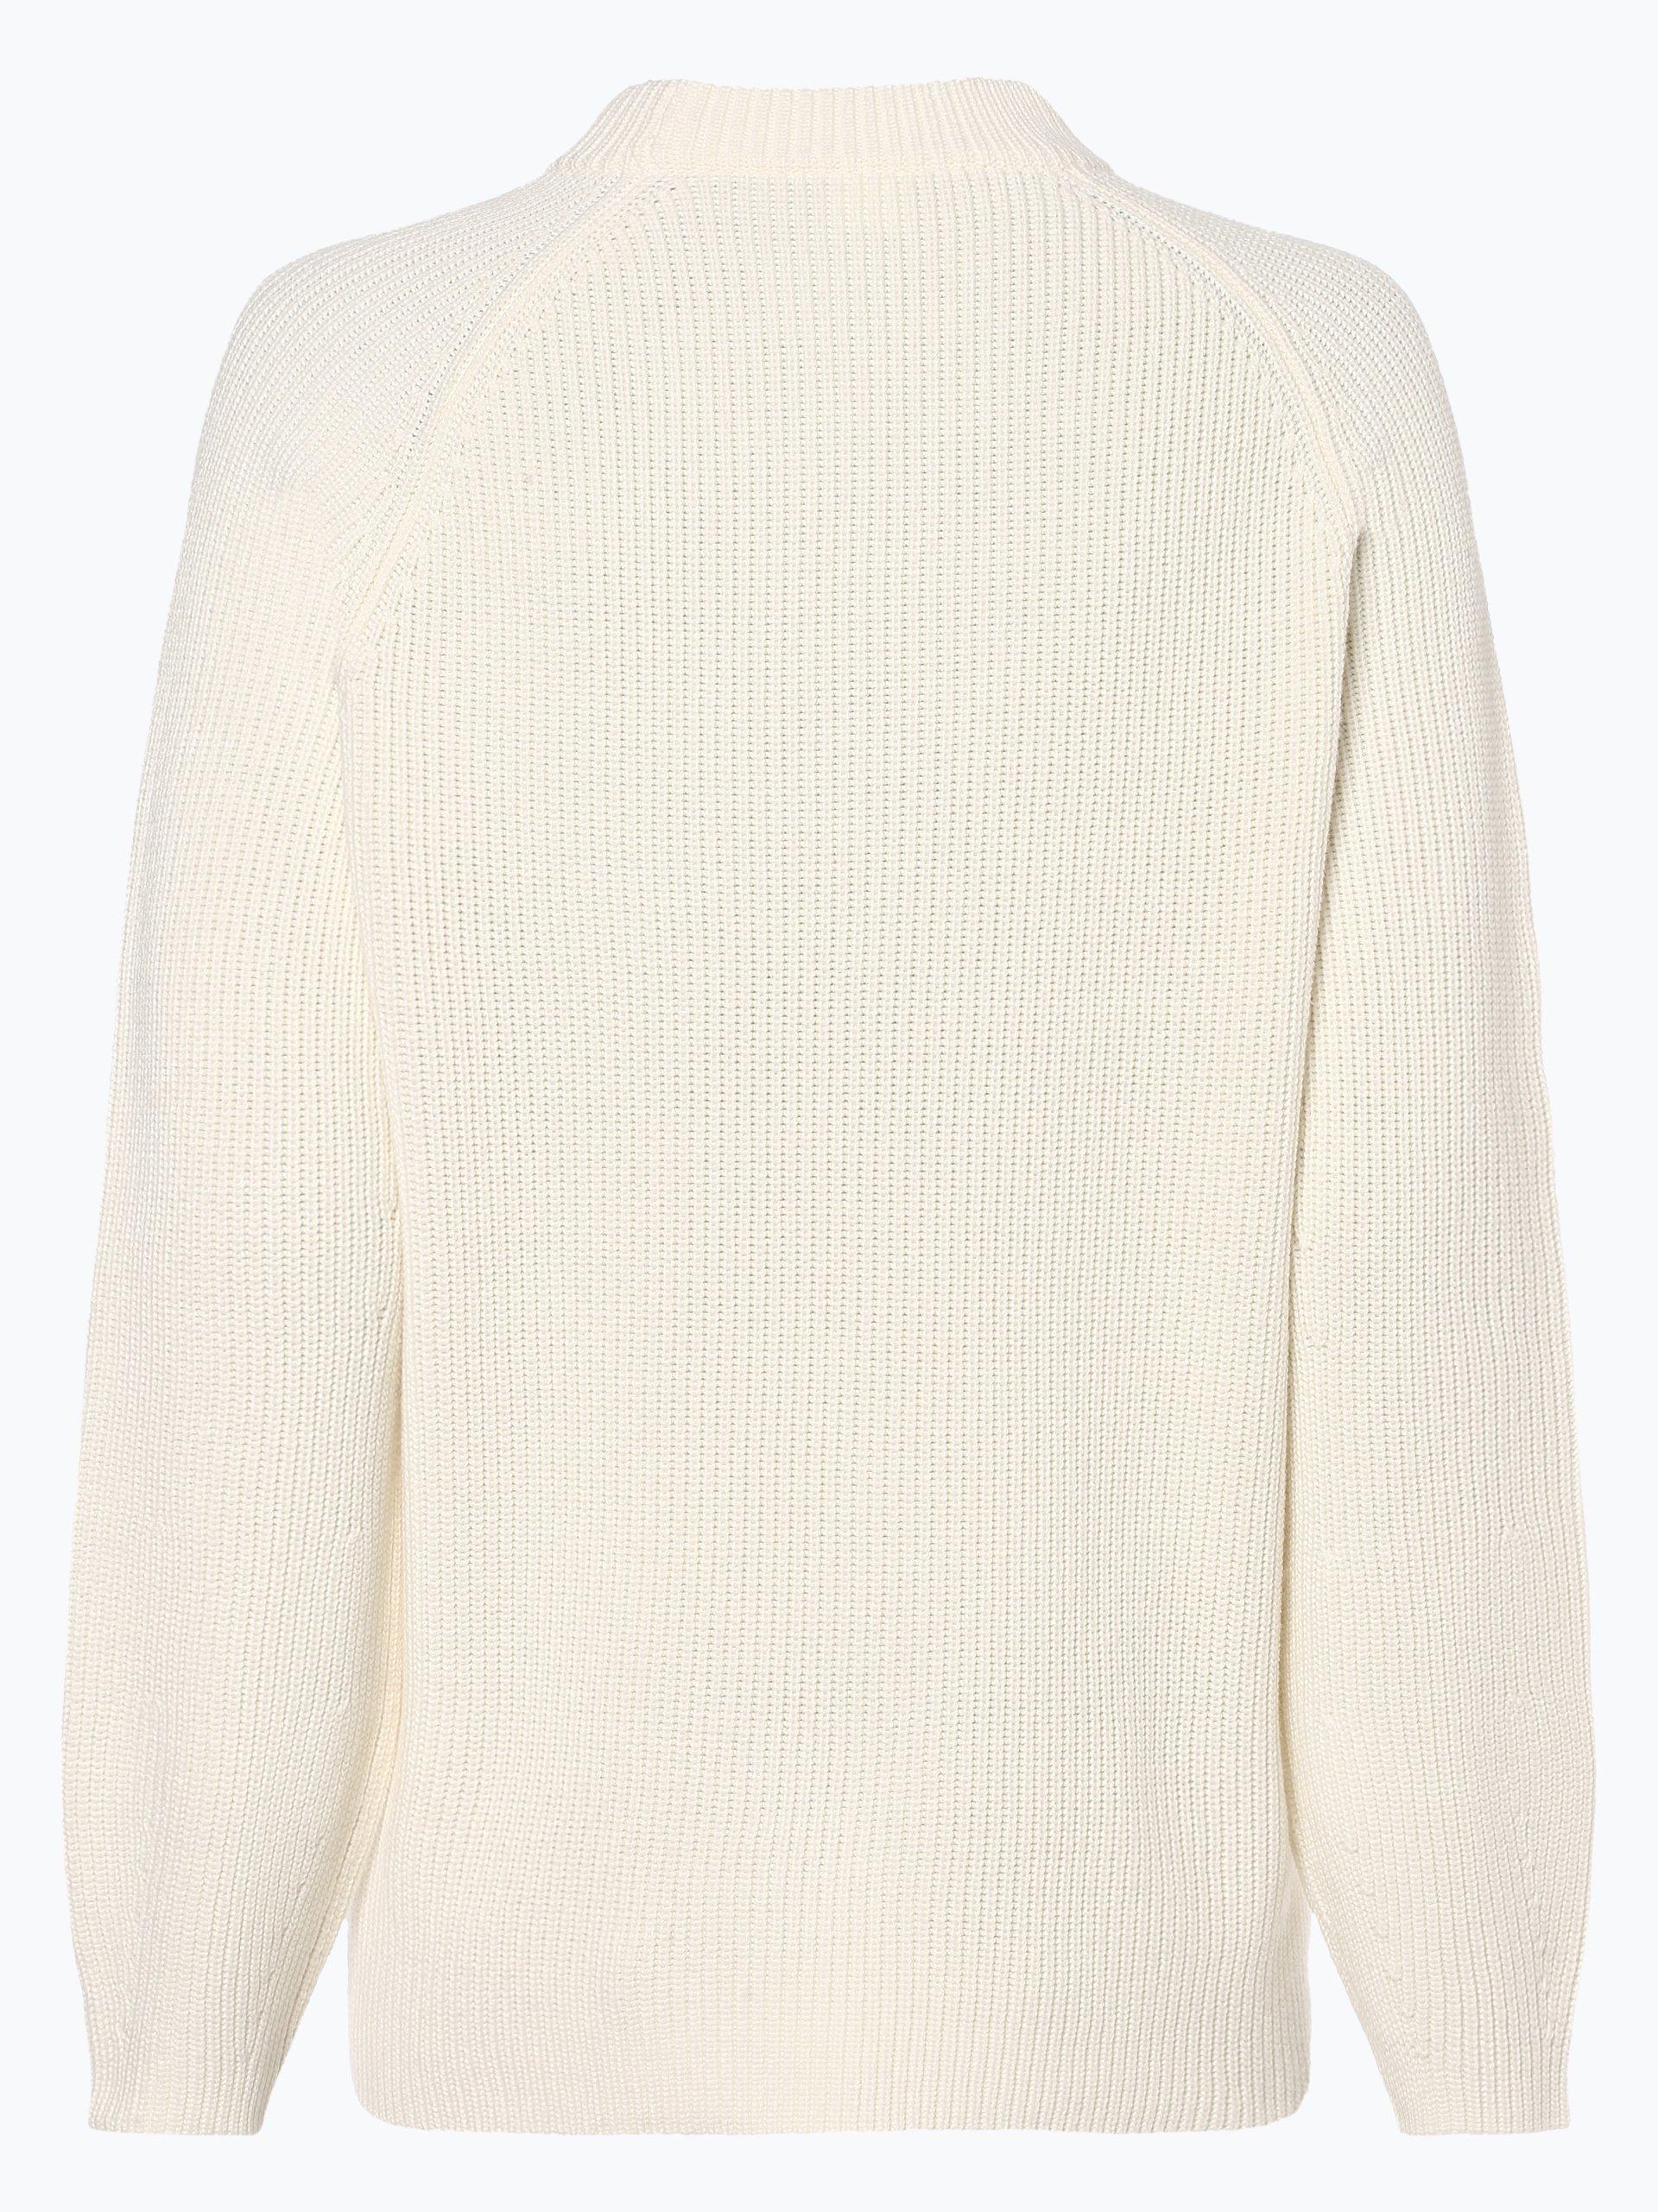 BOSS Casual Damen Pullover - Icylena